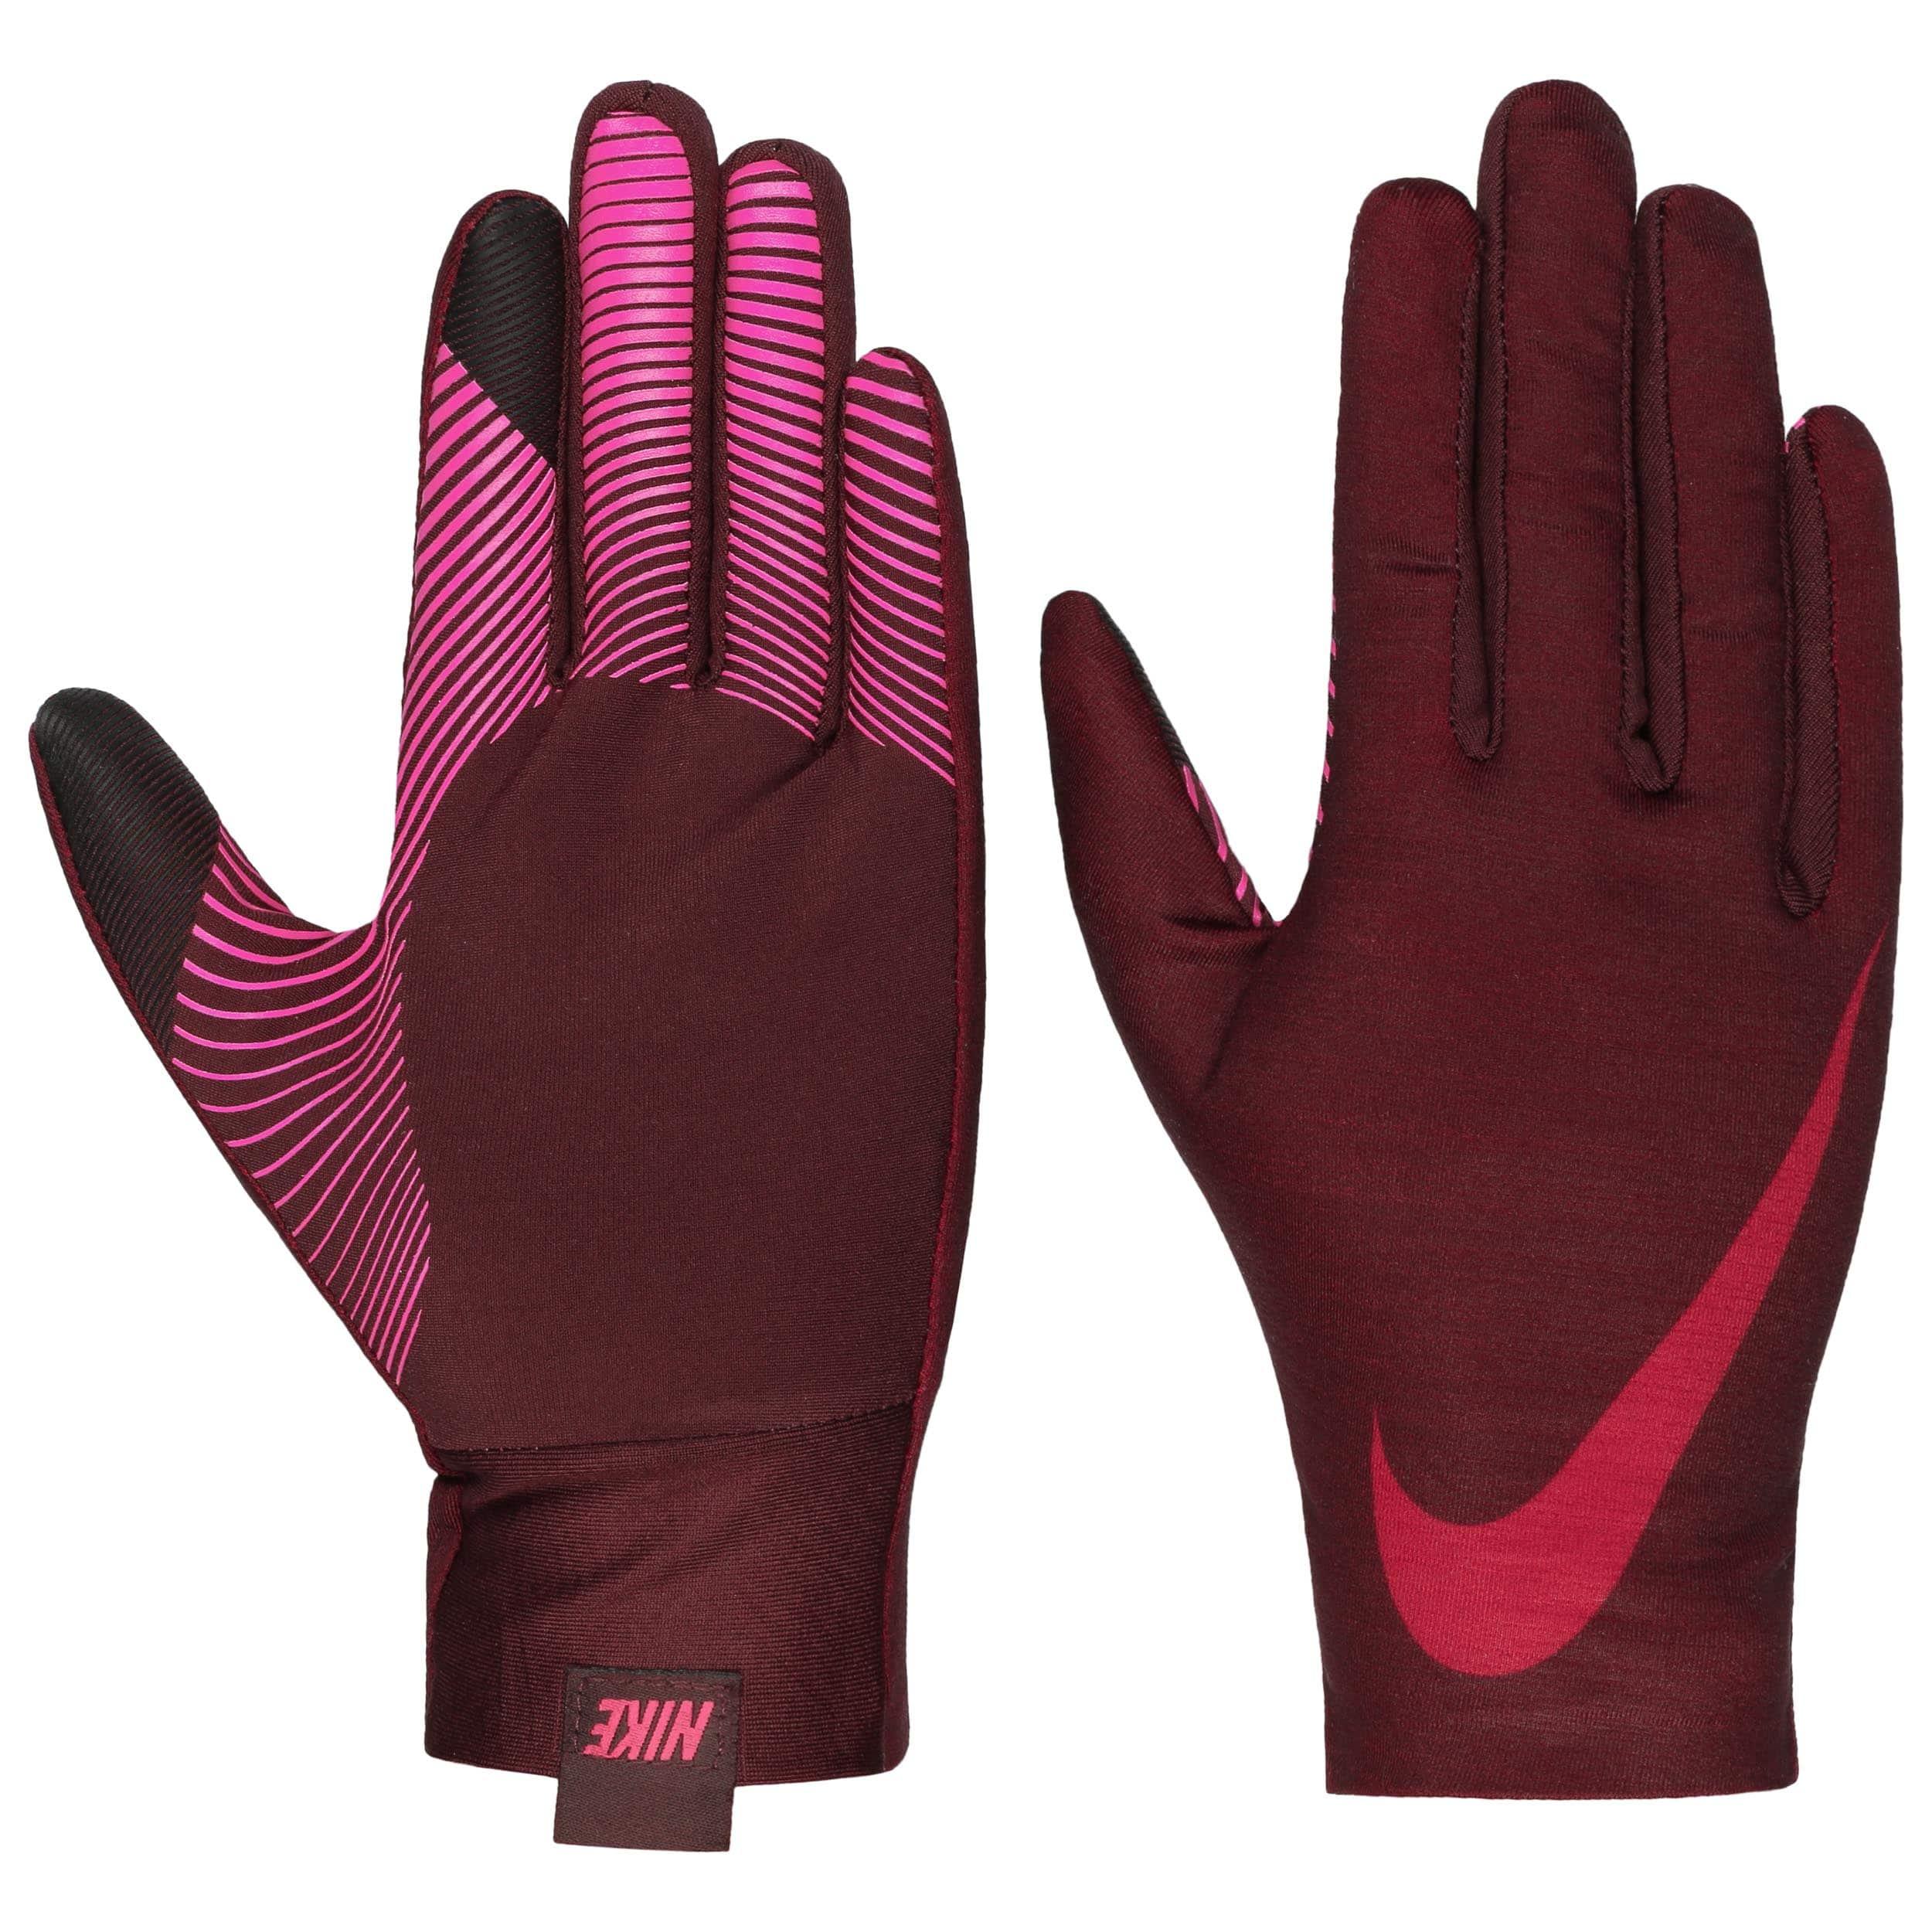 Pro Warm Liner Women´s Gloves by Nike, GBP 23,95 --> Hats